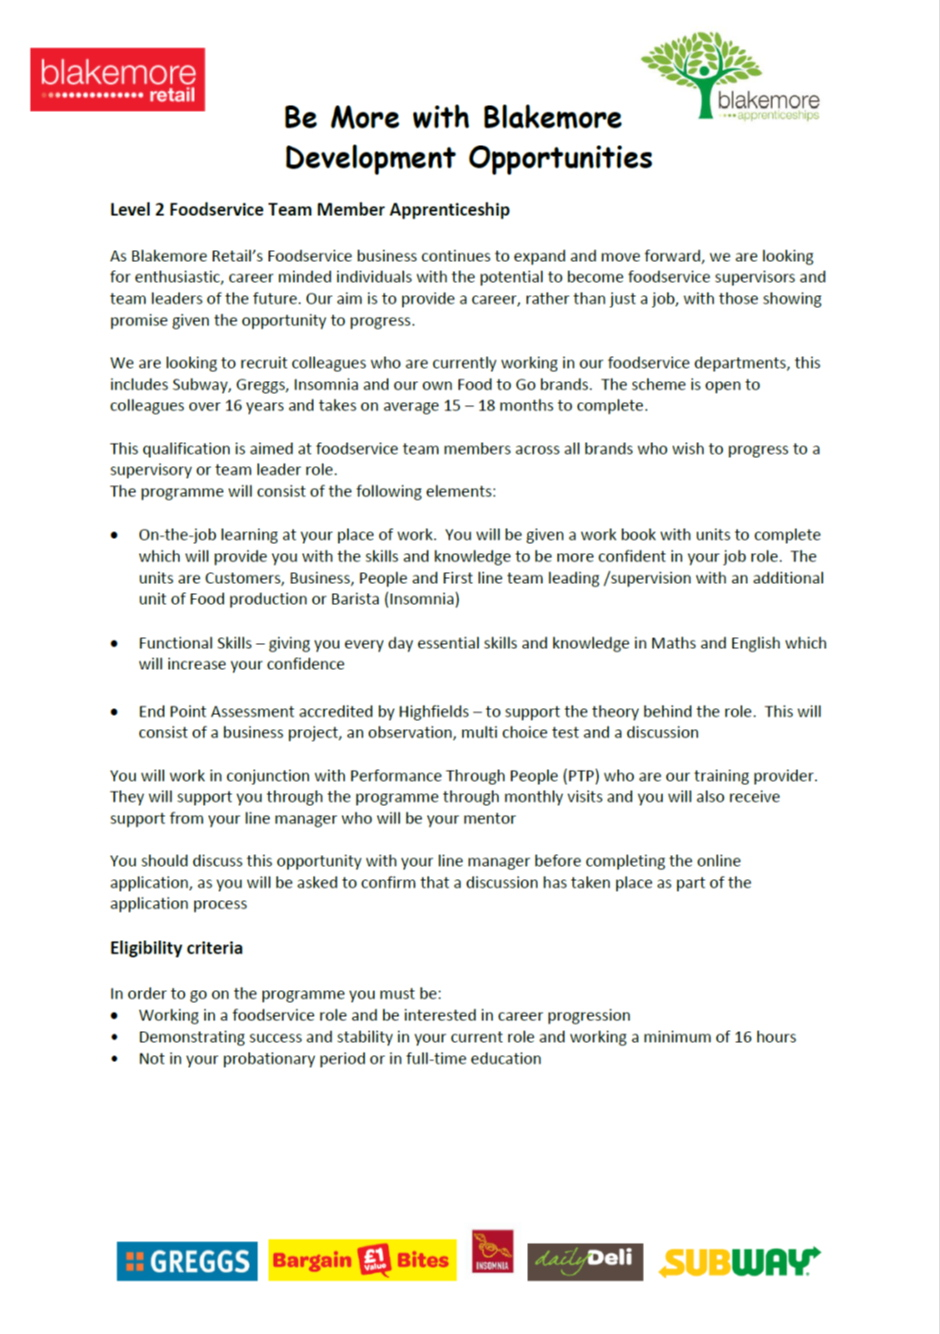 Blakemore Retail Level 2 apprenticeship